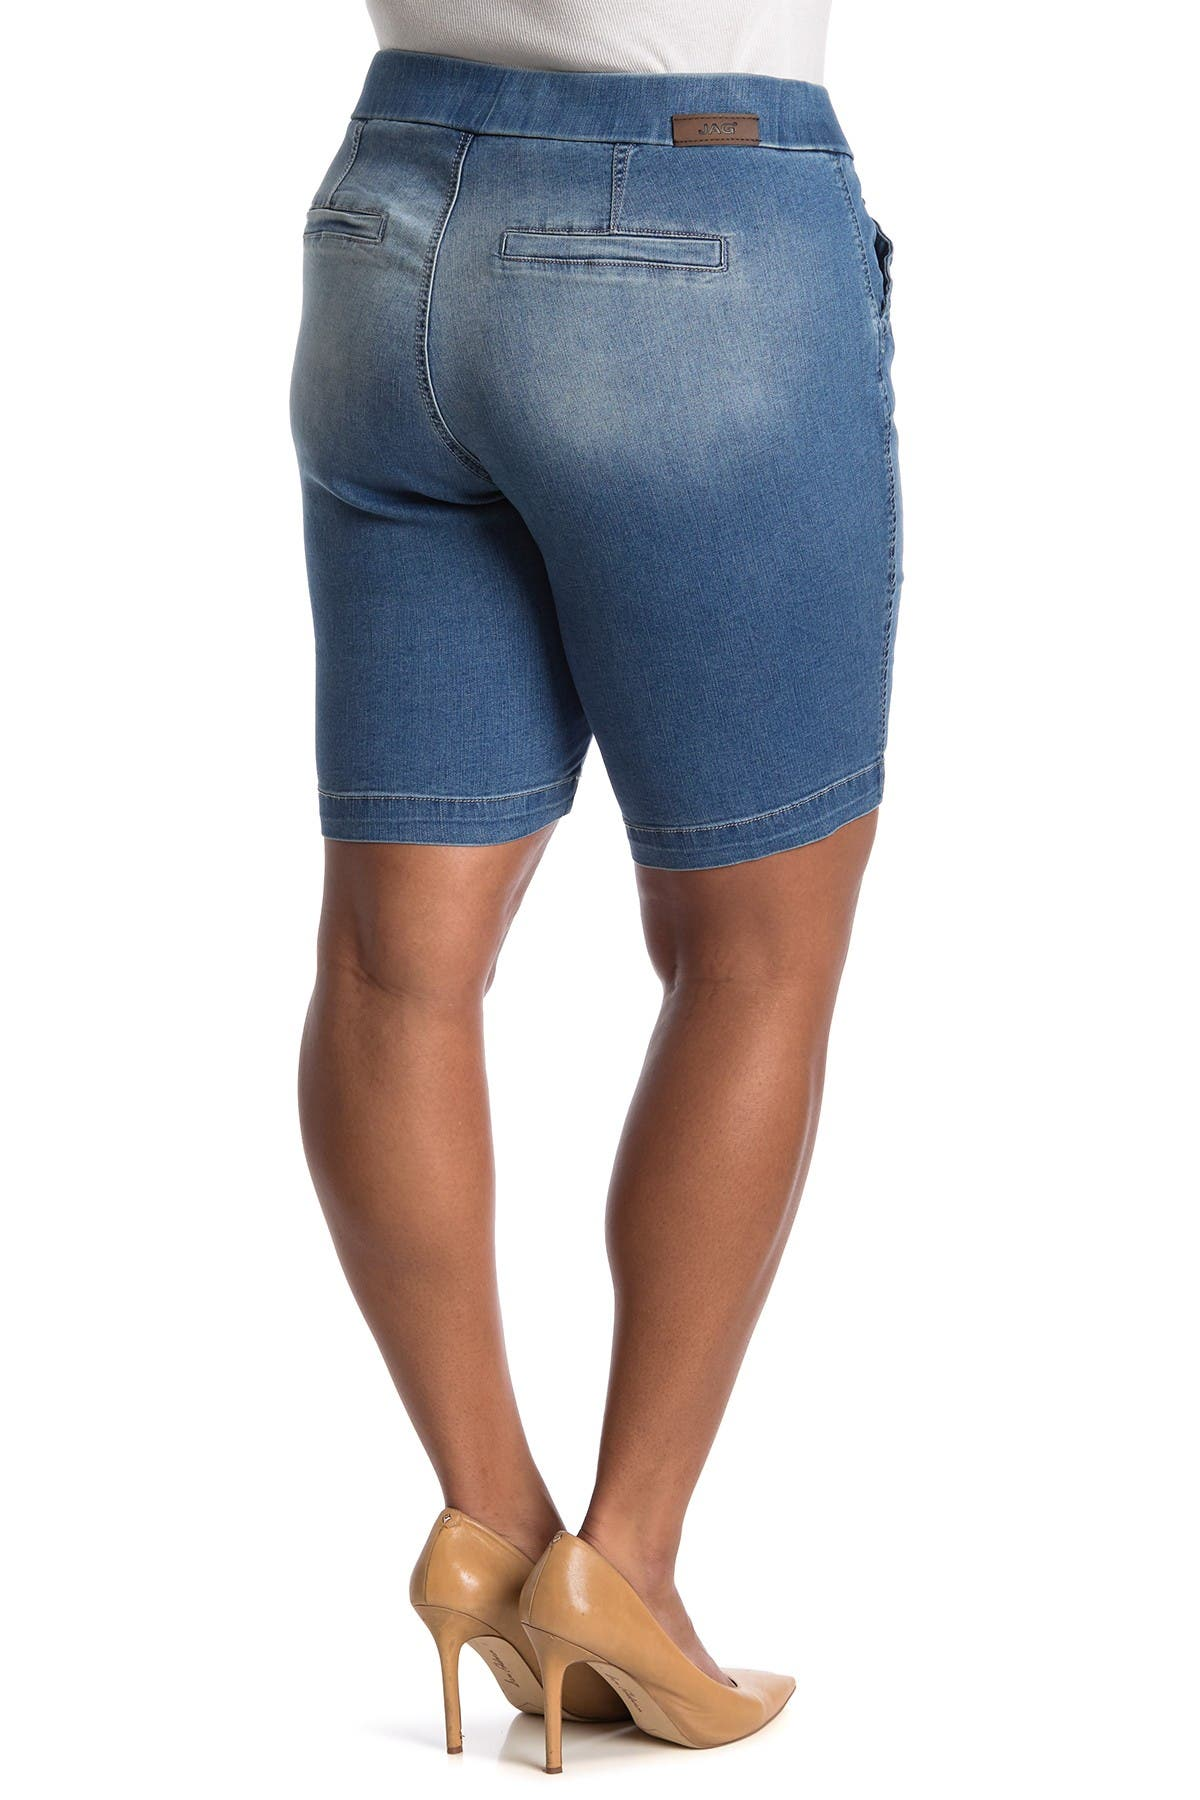 Image of JAG Jeans Gracie Denim Bermuda Shorts